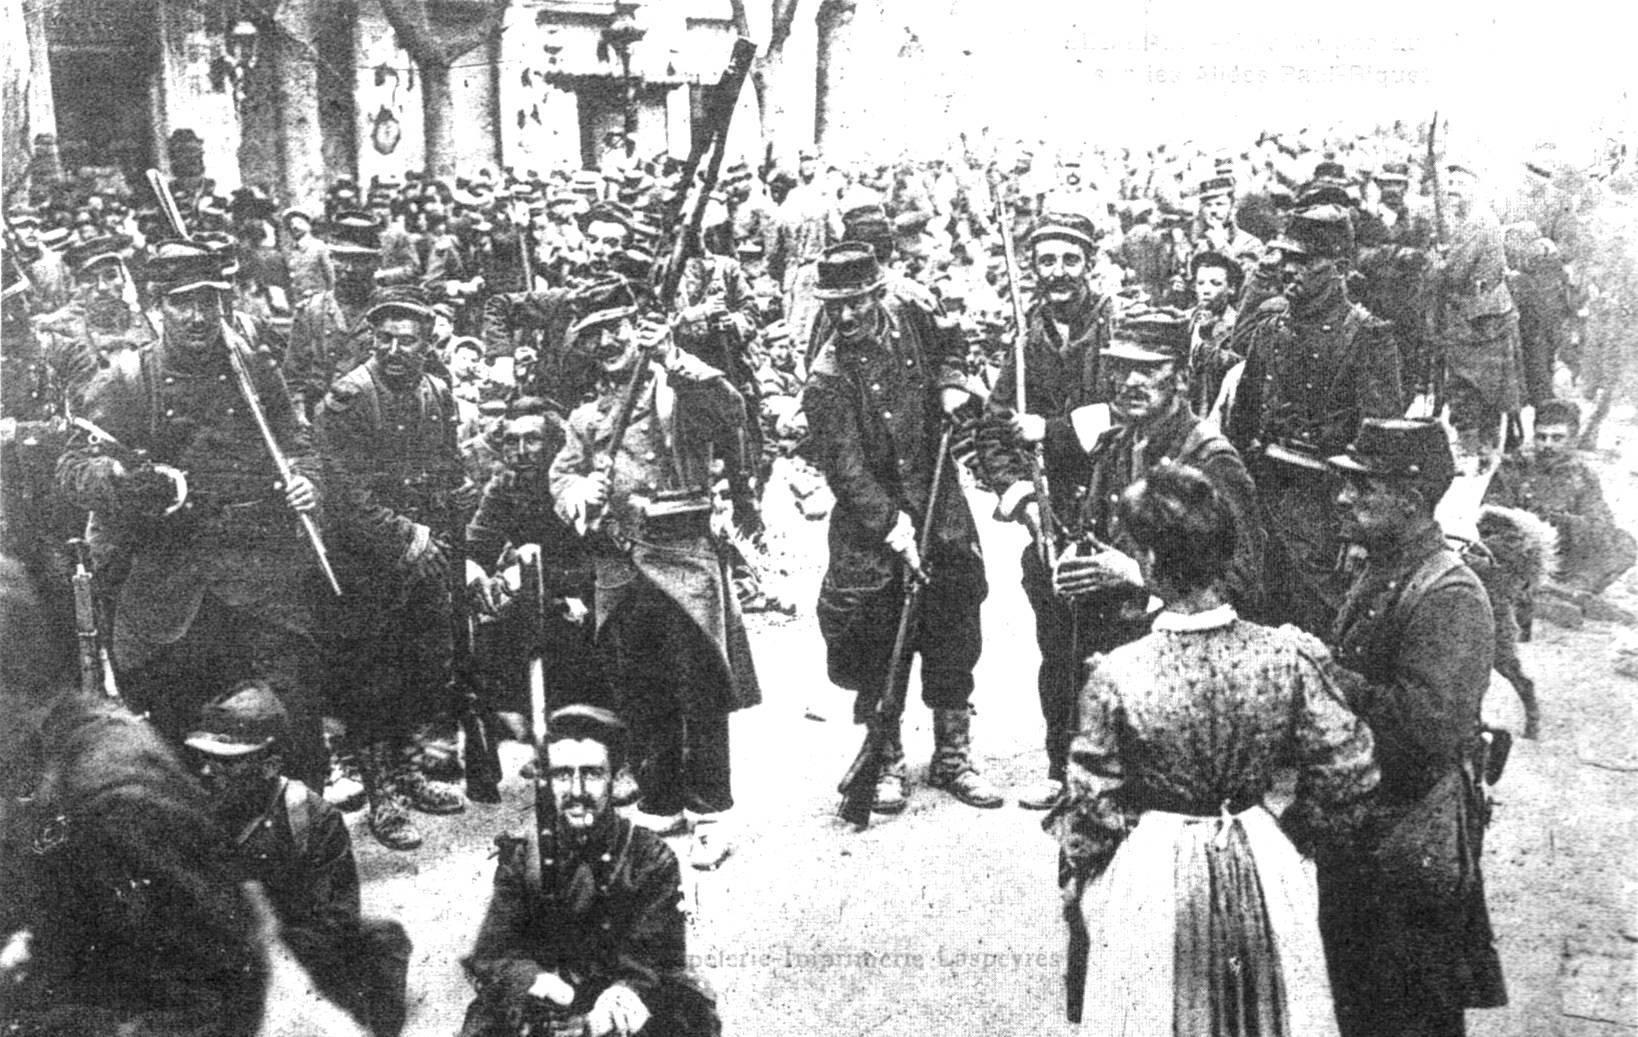 205 gaston montehus gloire 17ieme 1907 l 8